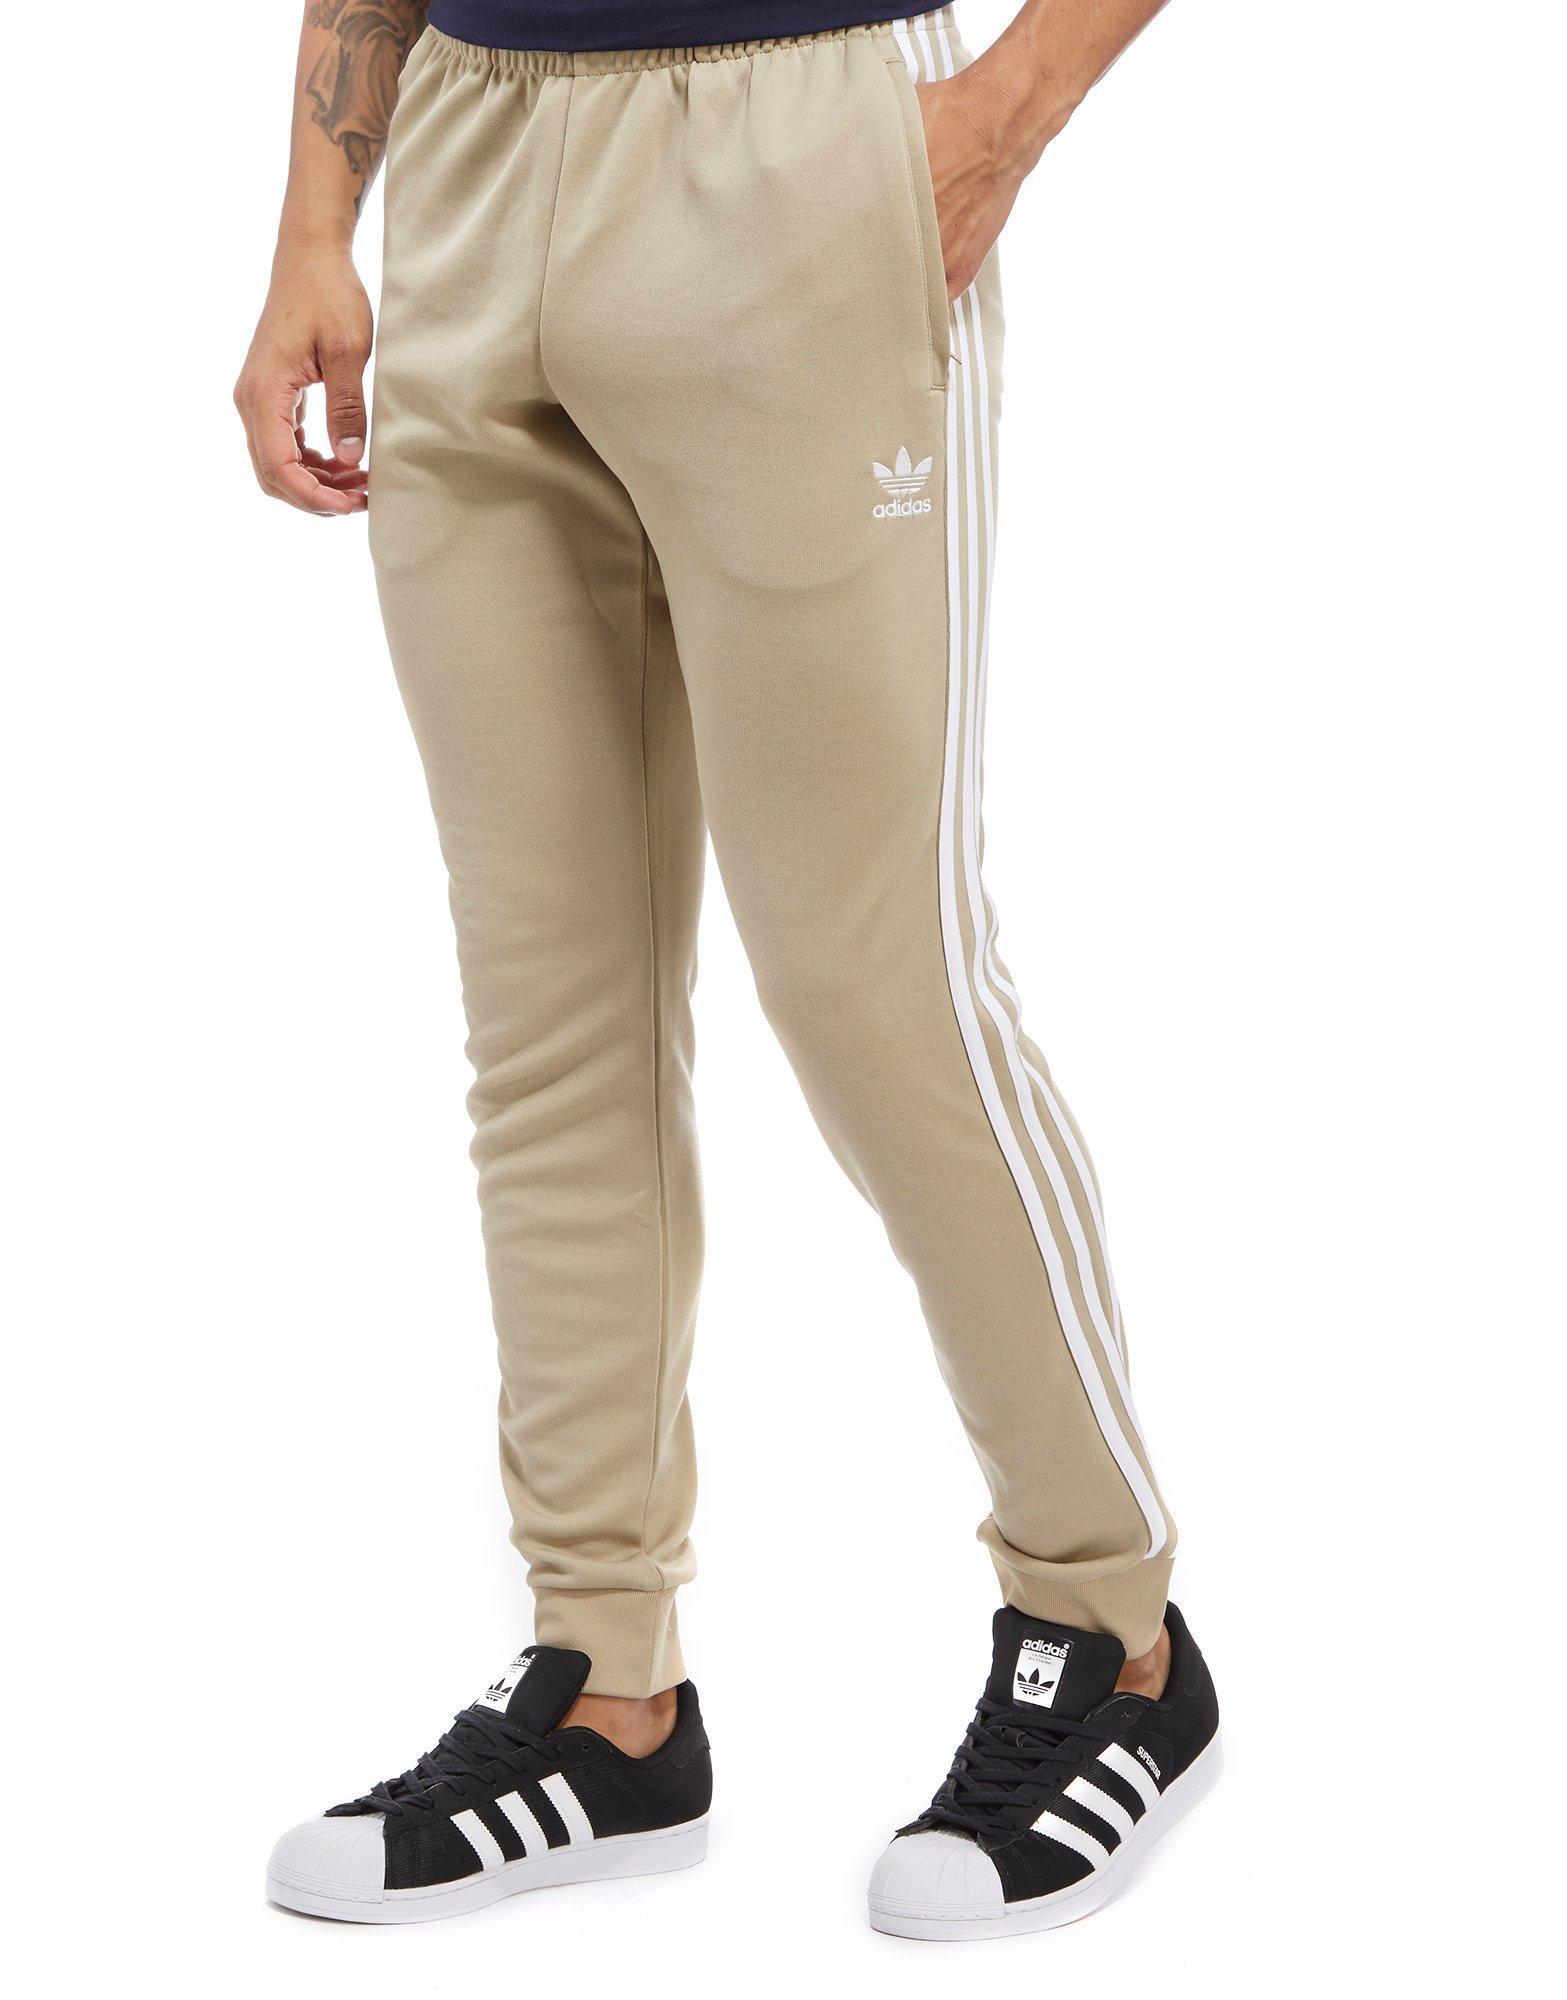 adidas pants khaki